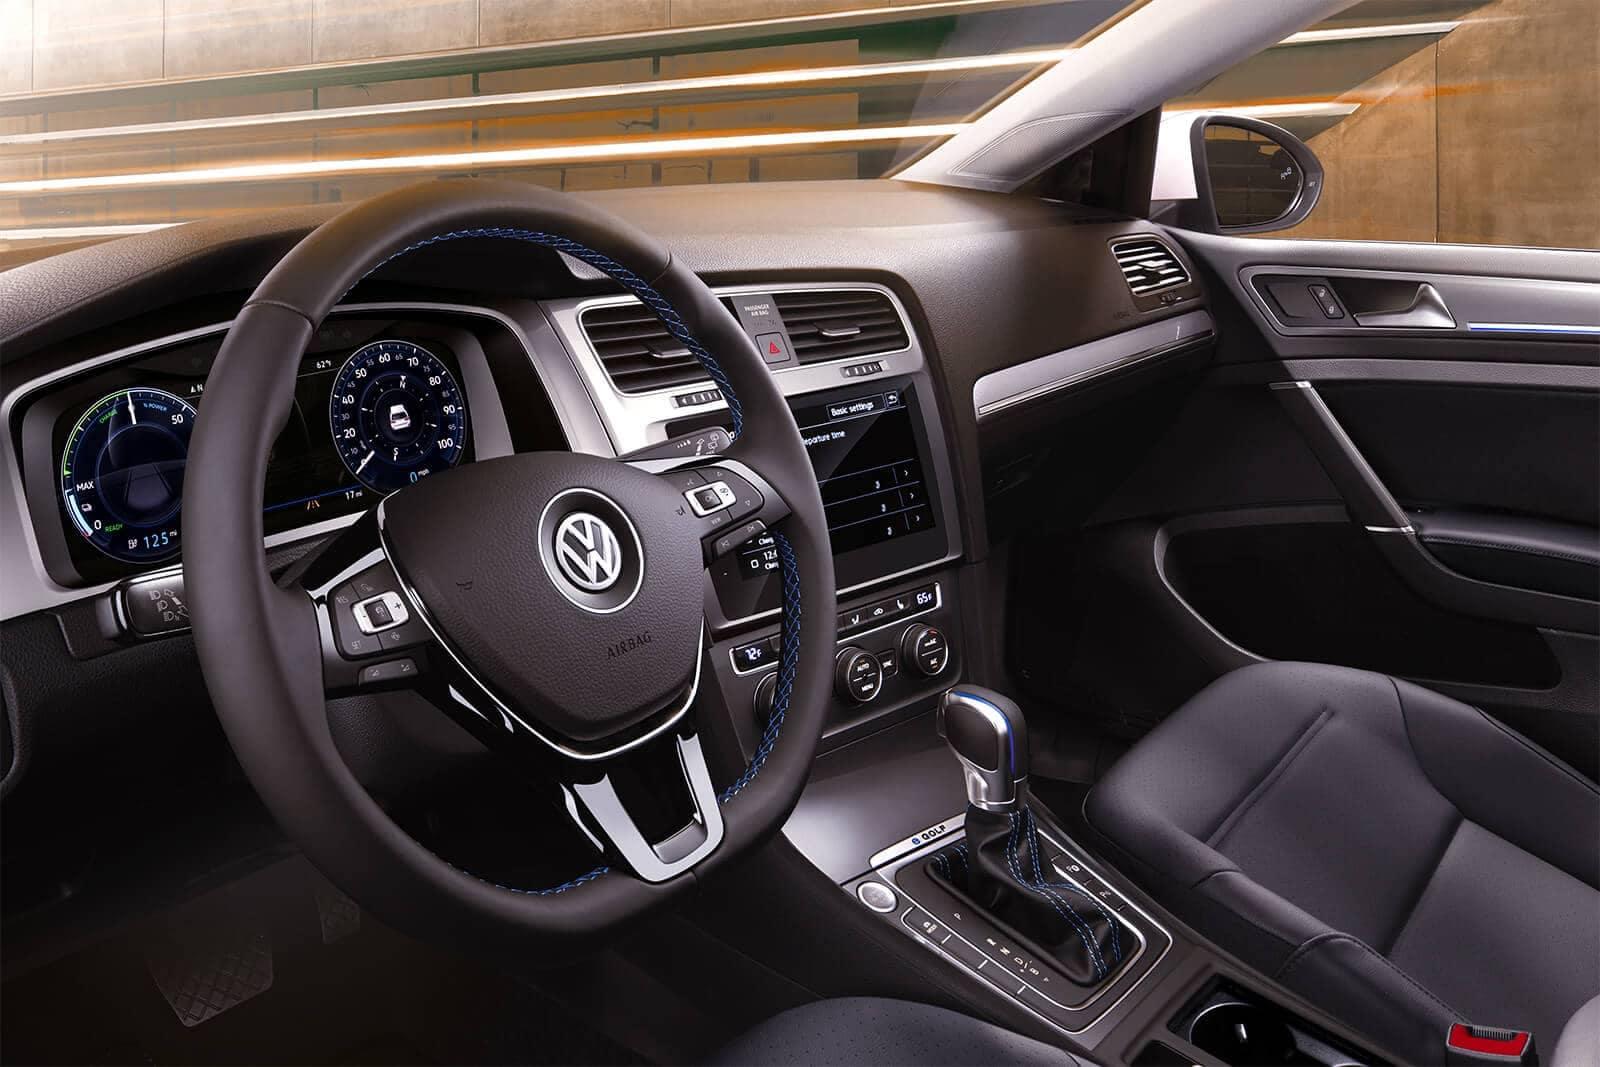 2019 Volkswagen e-Golf interior drivers seat